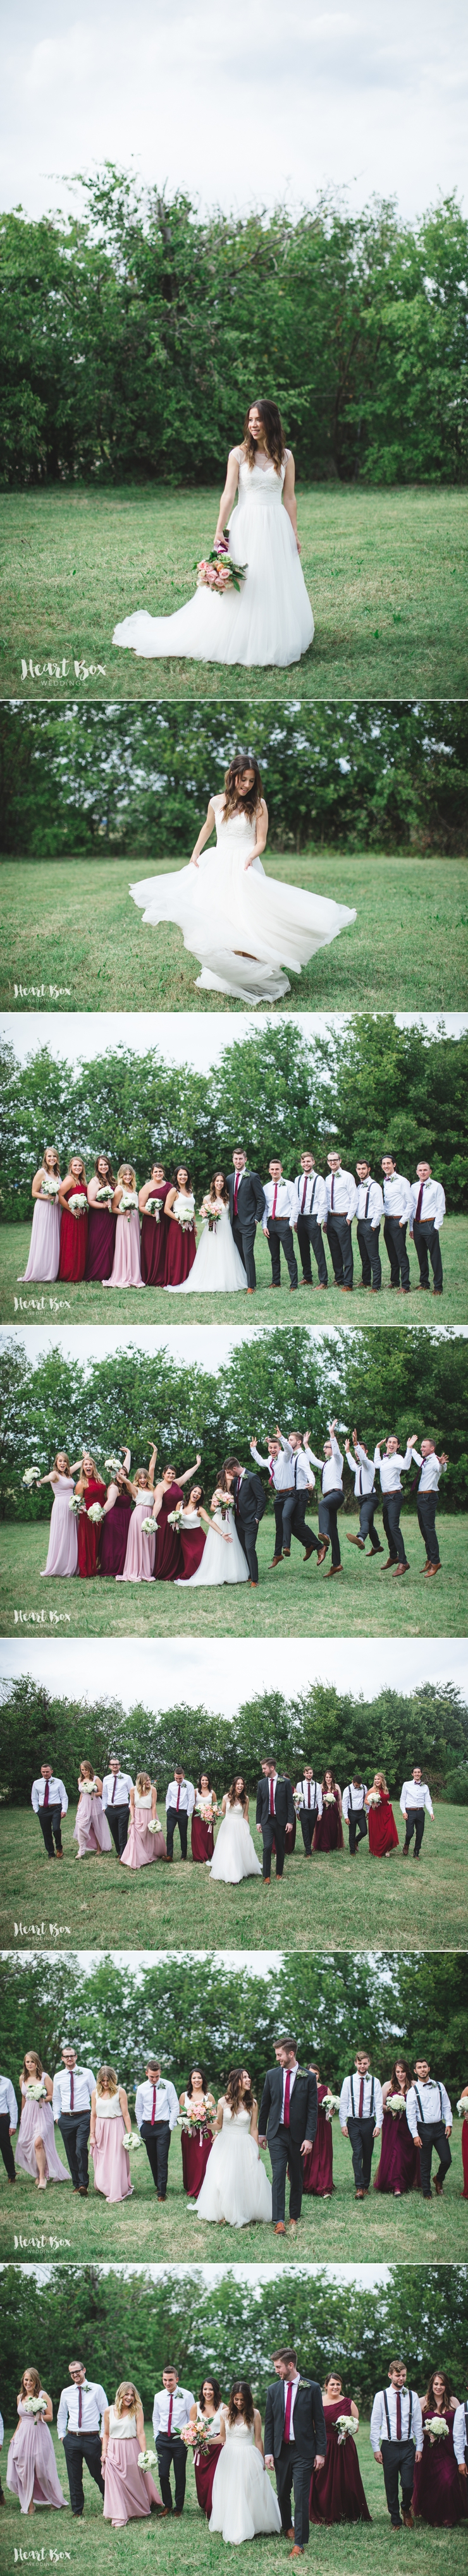 Hicks Wedding 12.jpg